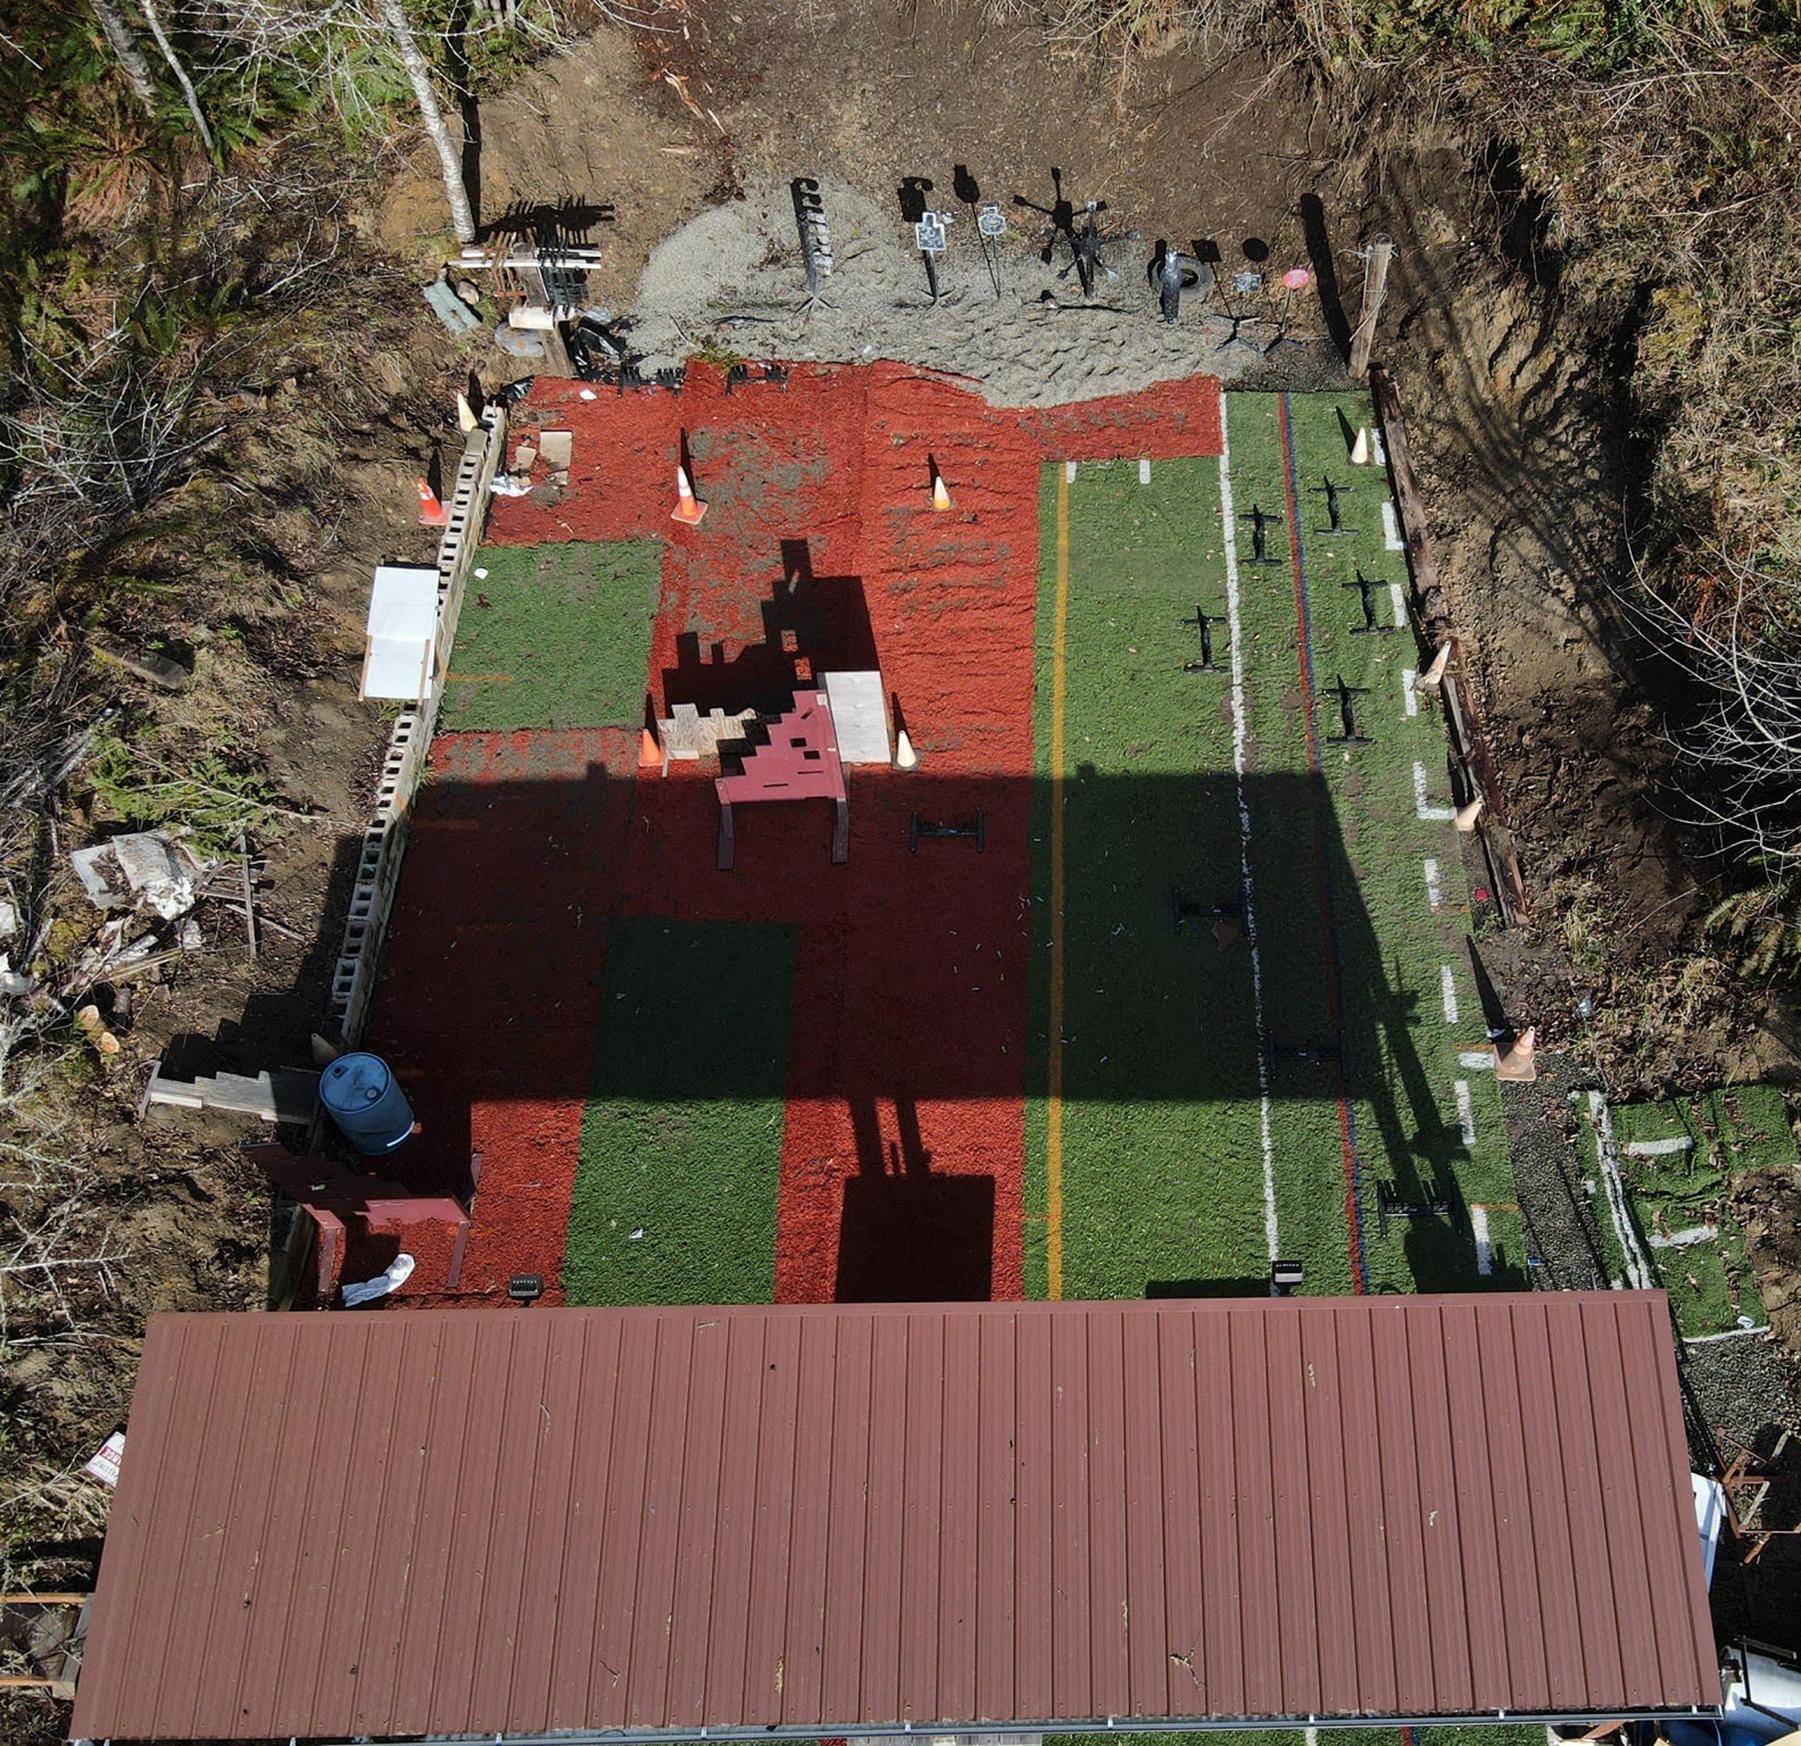 arial view of shooting range